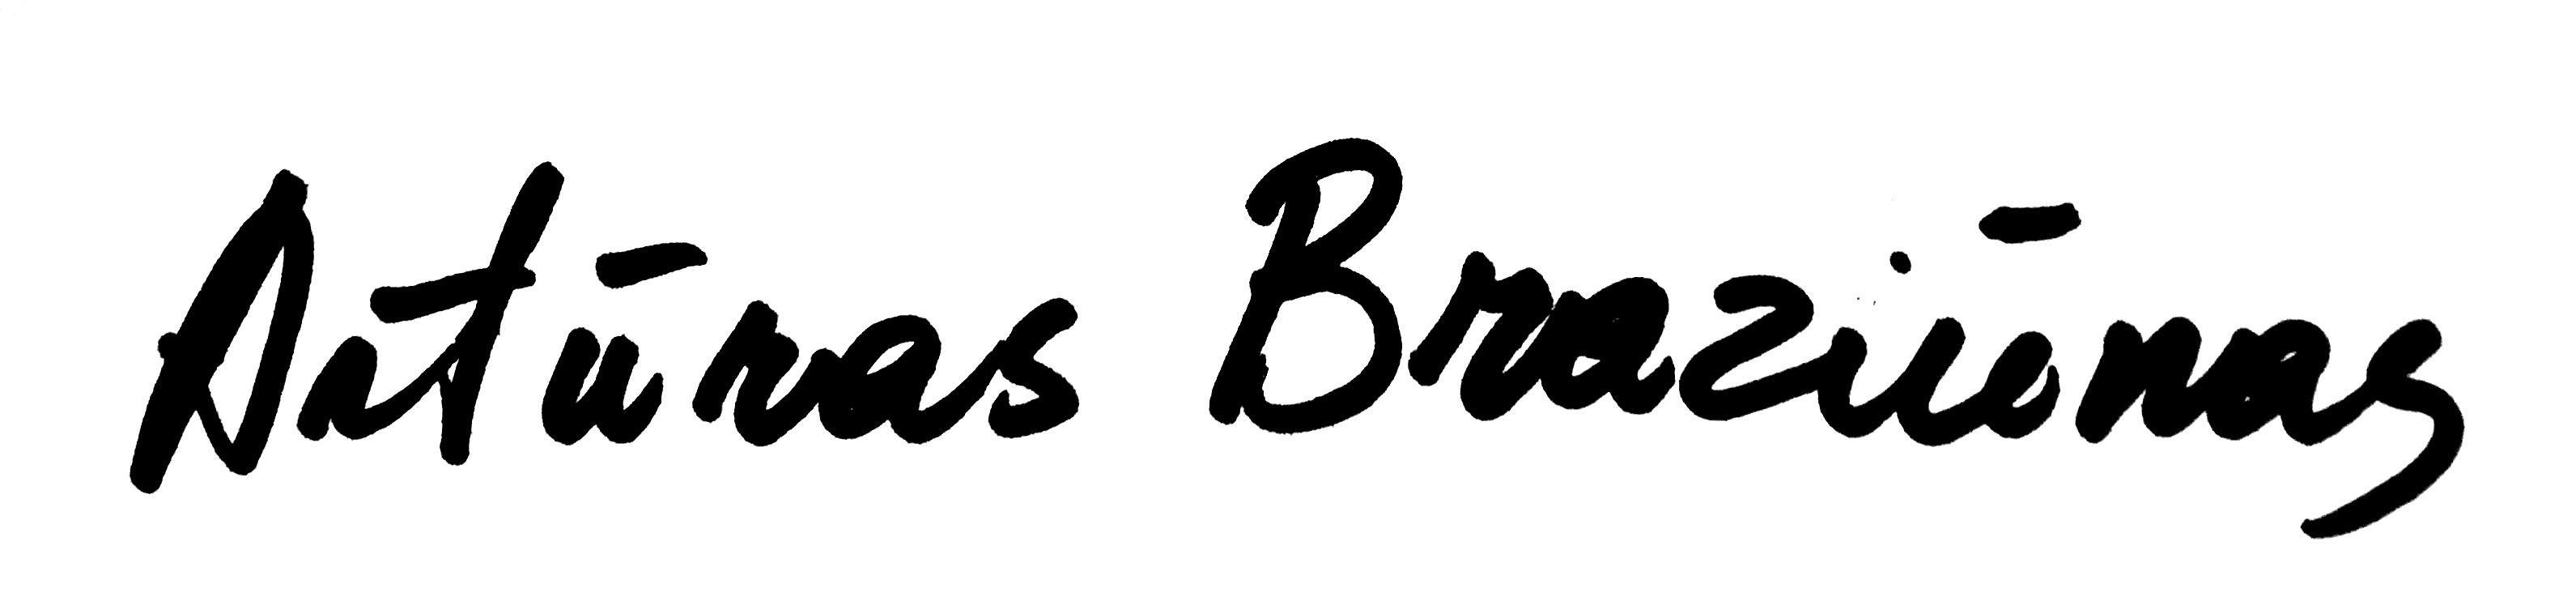 Arturas Braziunas ART's Signature